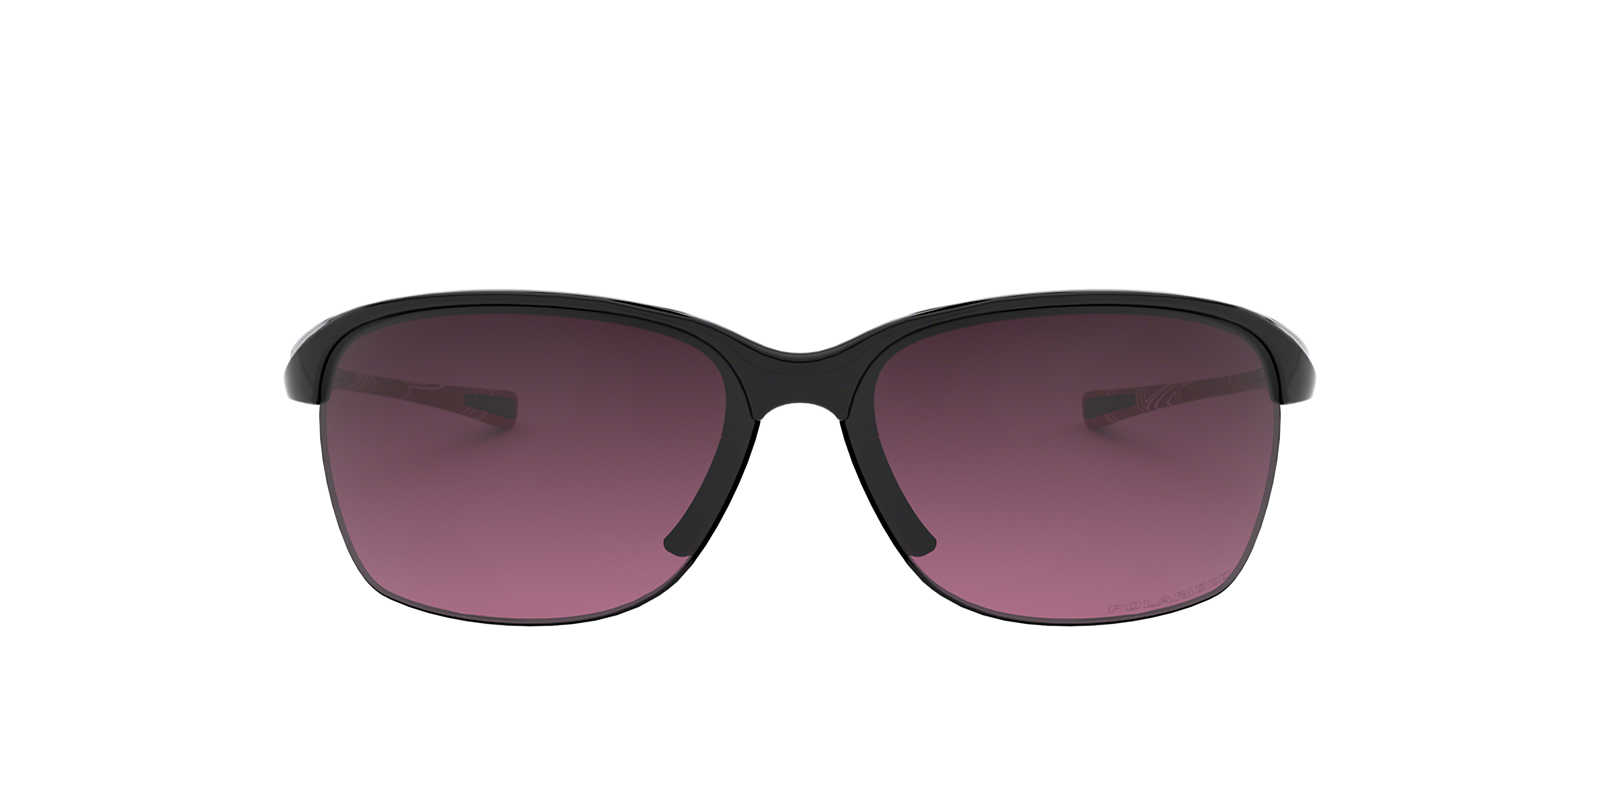 bswas Mountain Bike & Cycling Sunglasses | Sunglass Hut